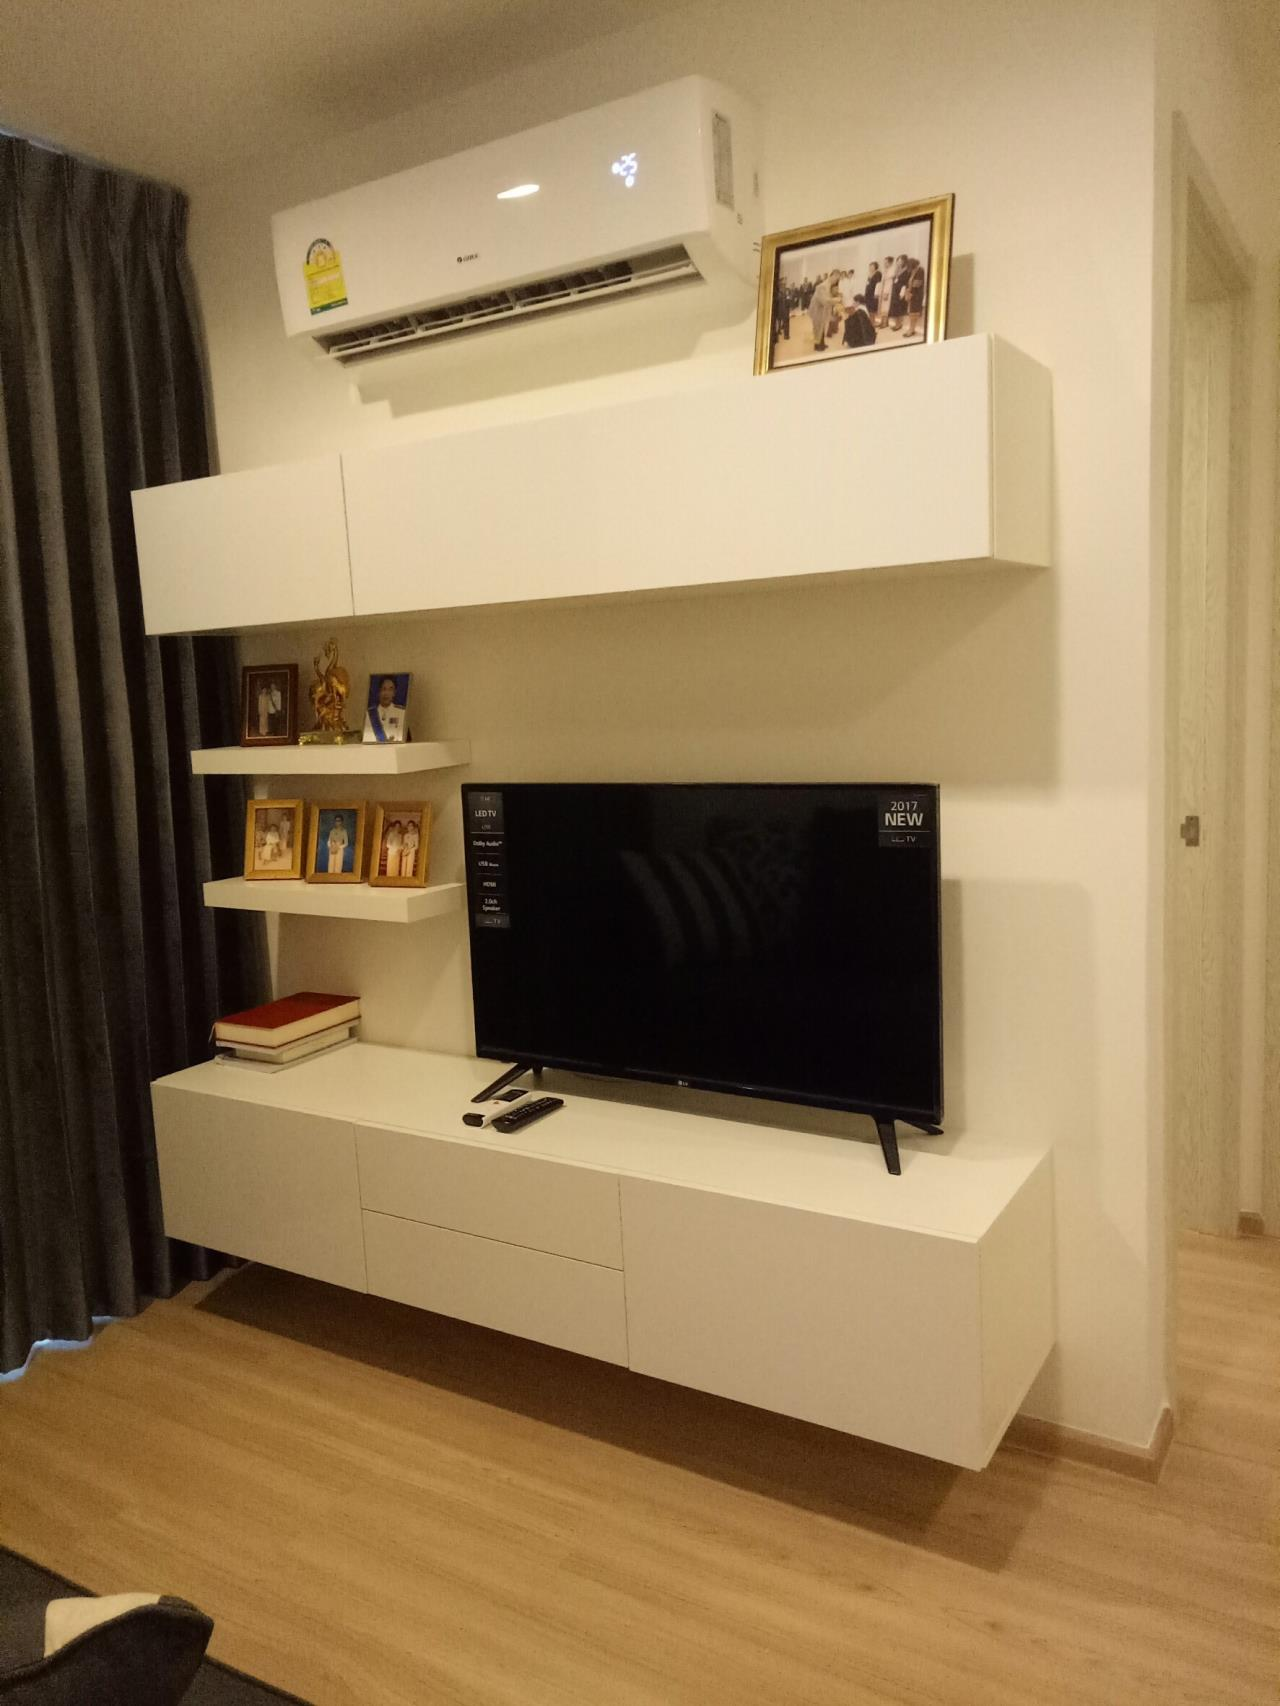 Quality Life Property Agency's Artemis Sukhumvit 77 (RENT / SELL) 2